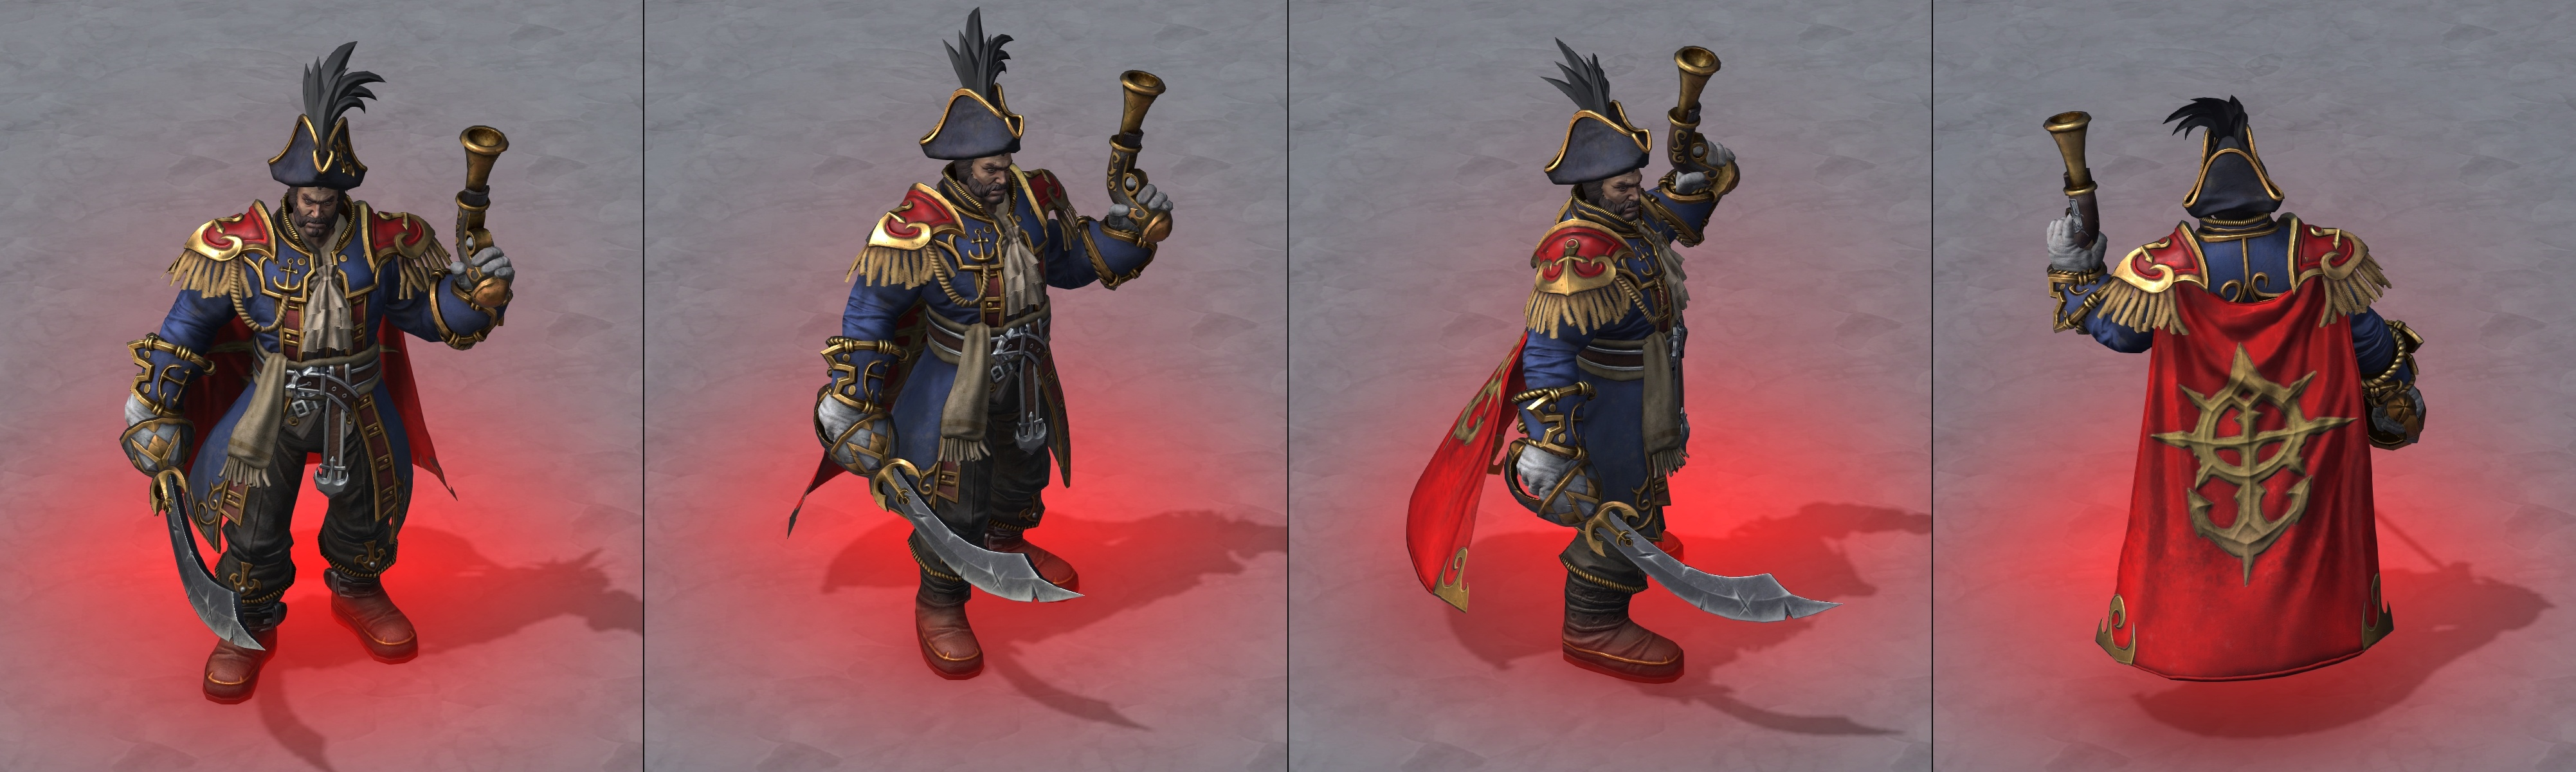 Warcraft Iii Reforged Character Models Arthas Sylvanas Jaina